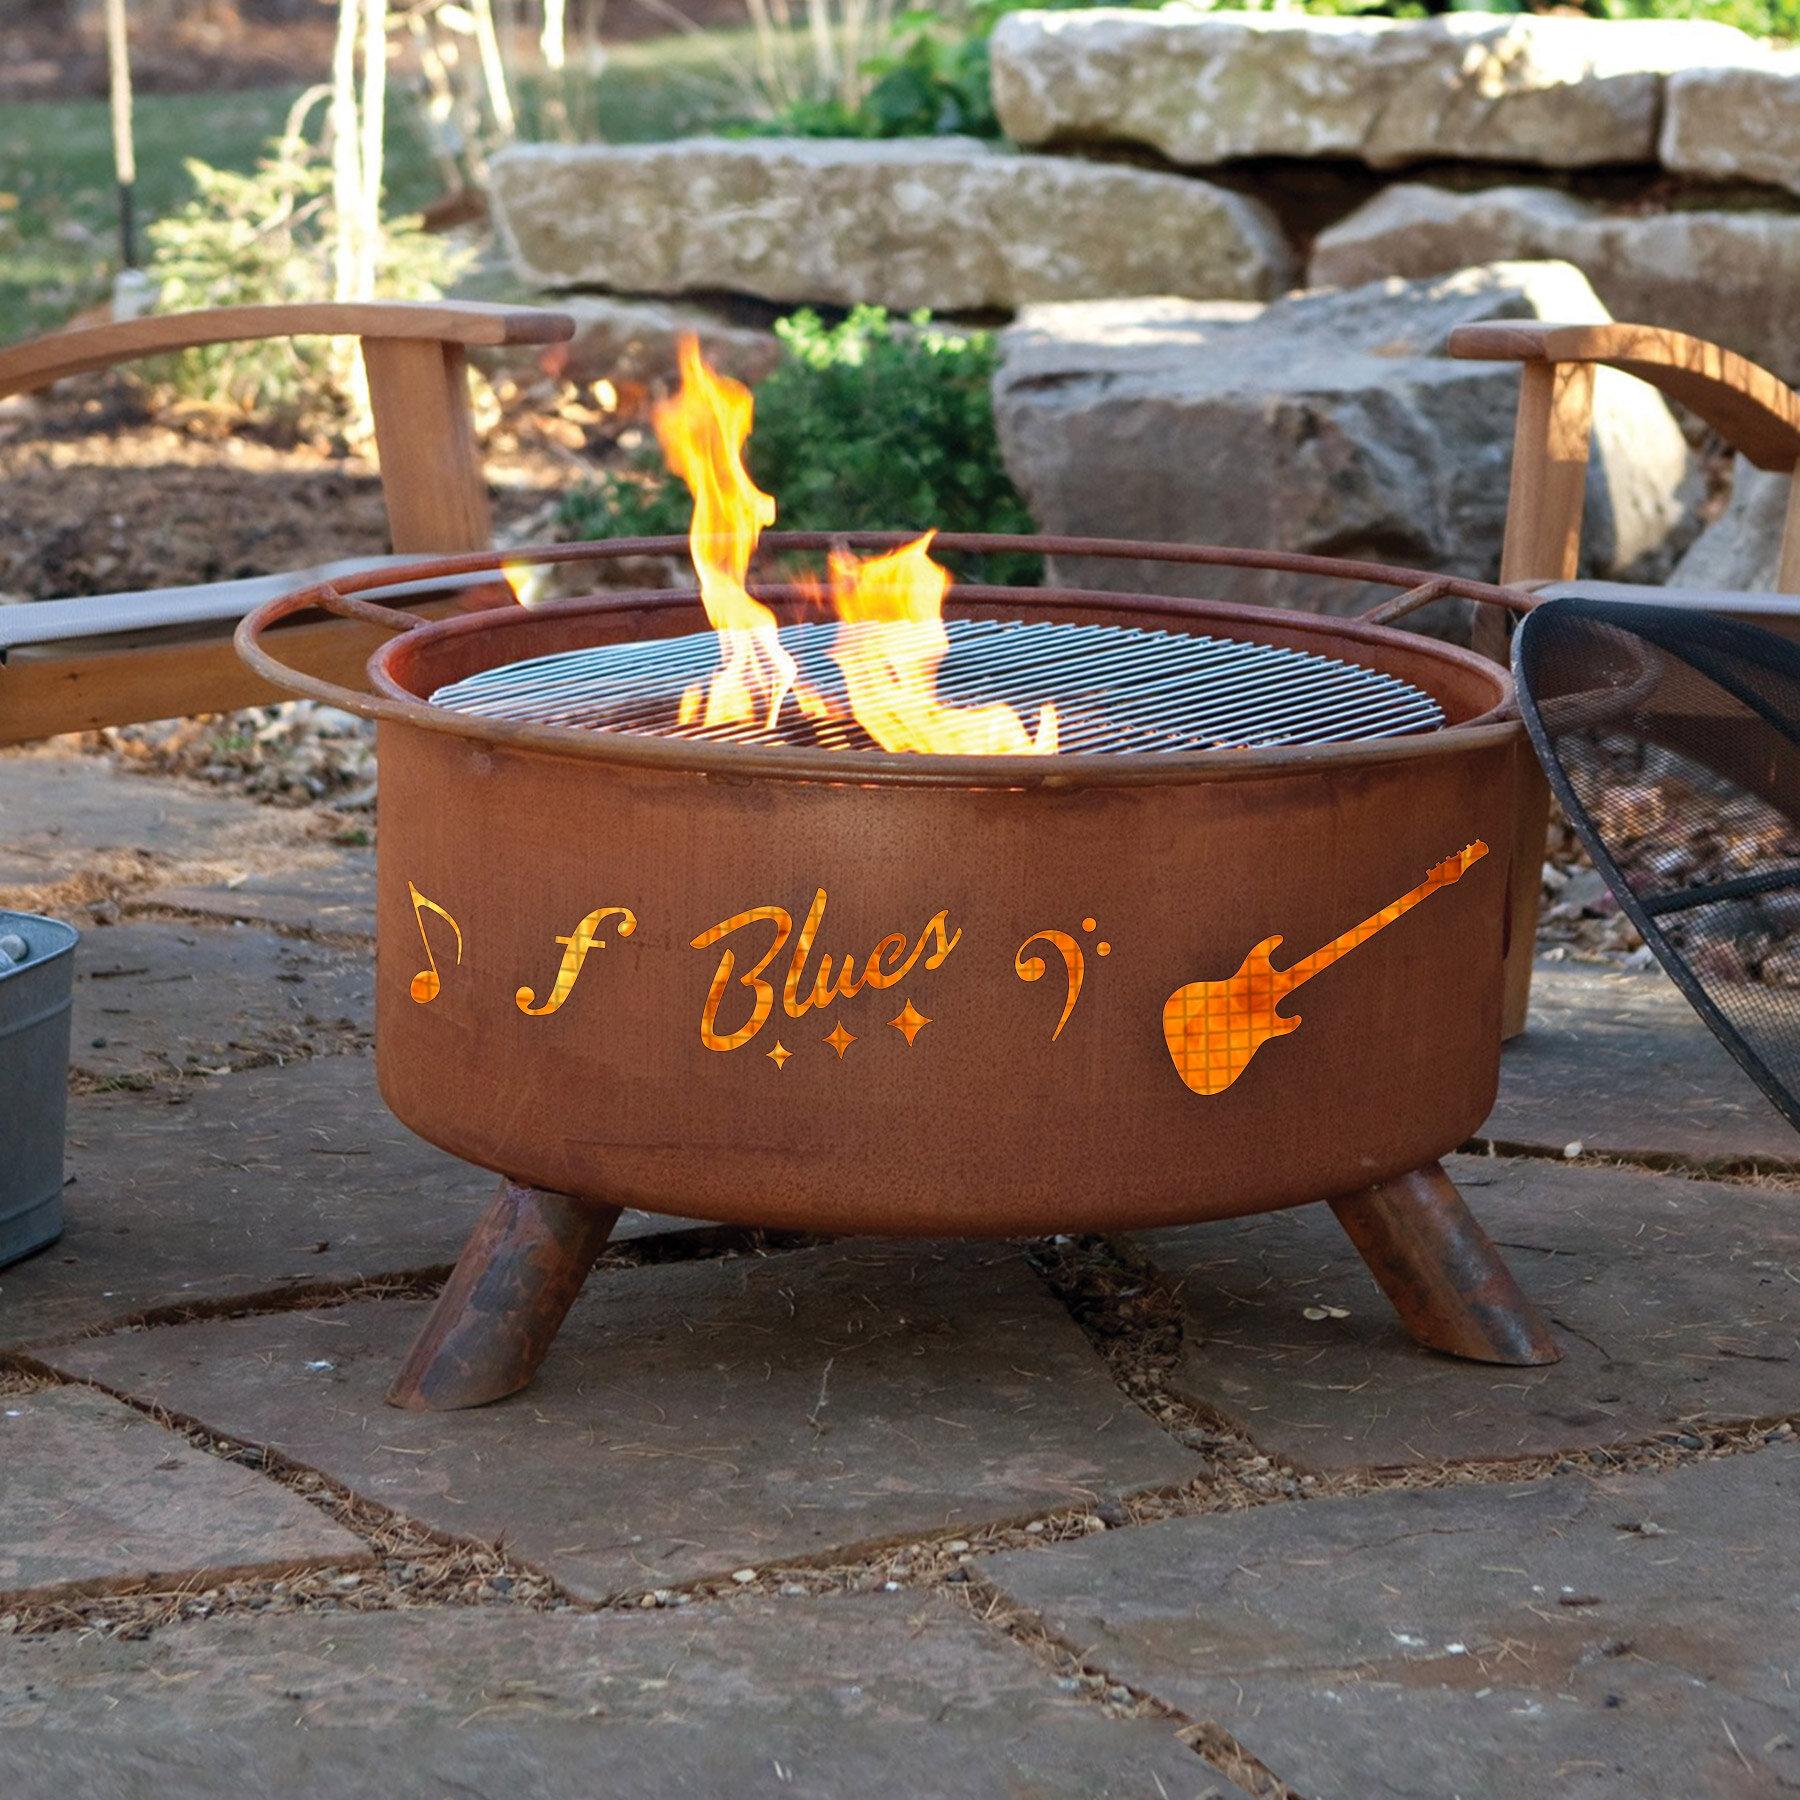 Millwood Pines Jeanlouis Music Steel Wood Burning Fire Pit Reviews Wayfair